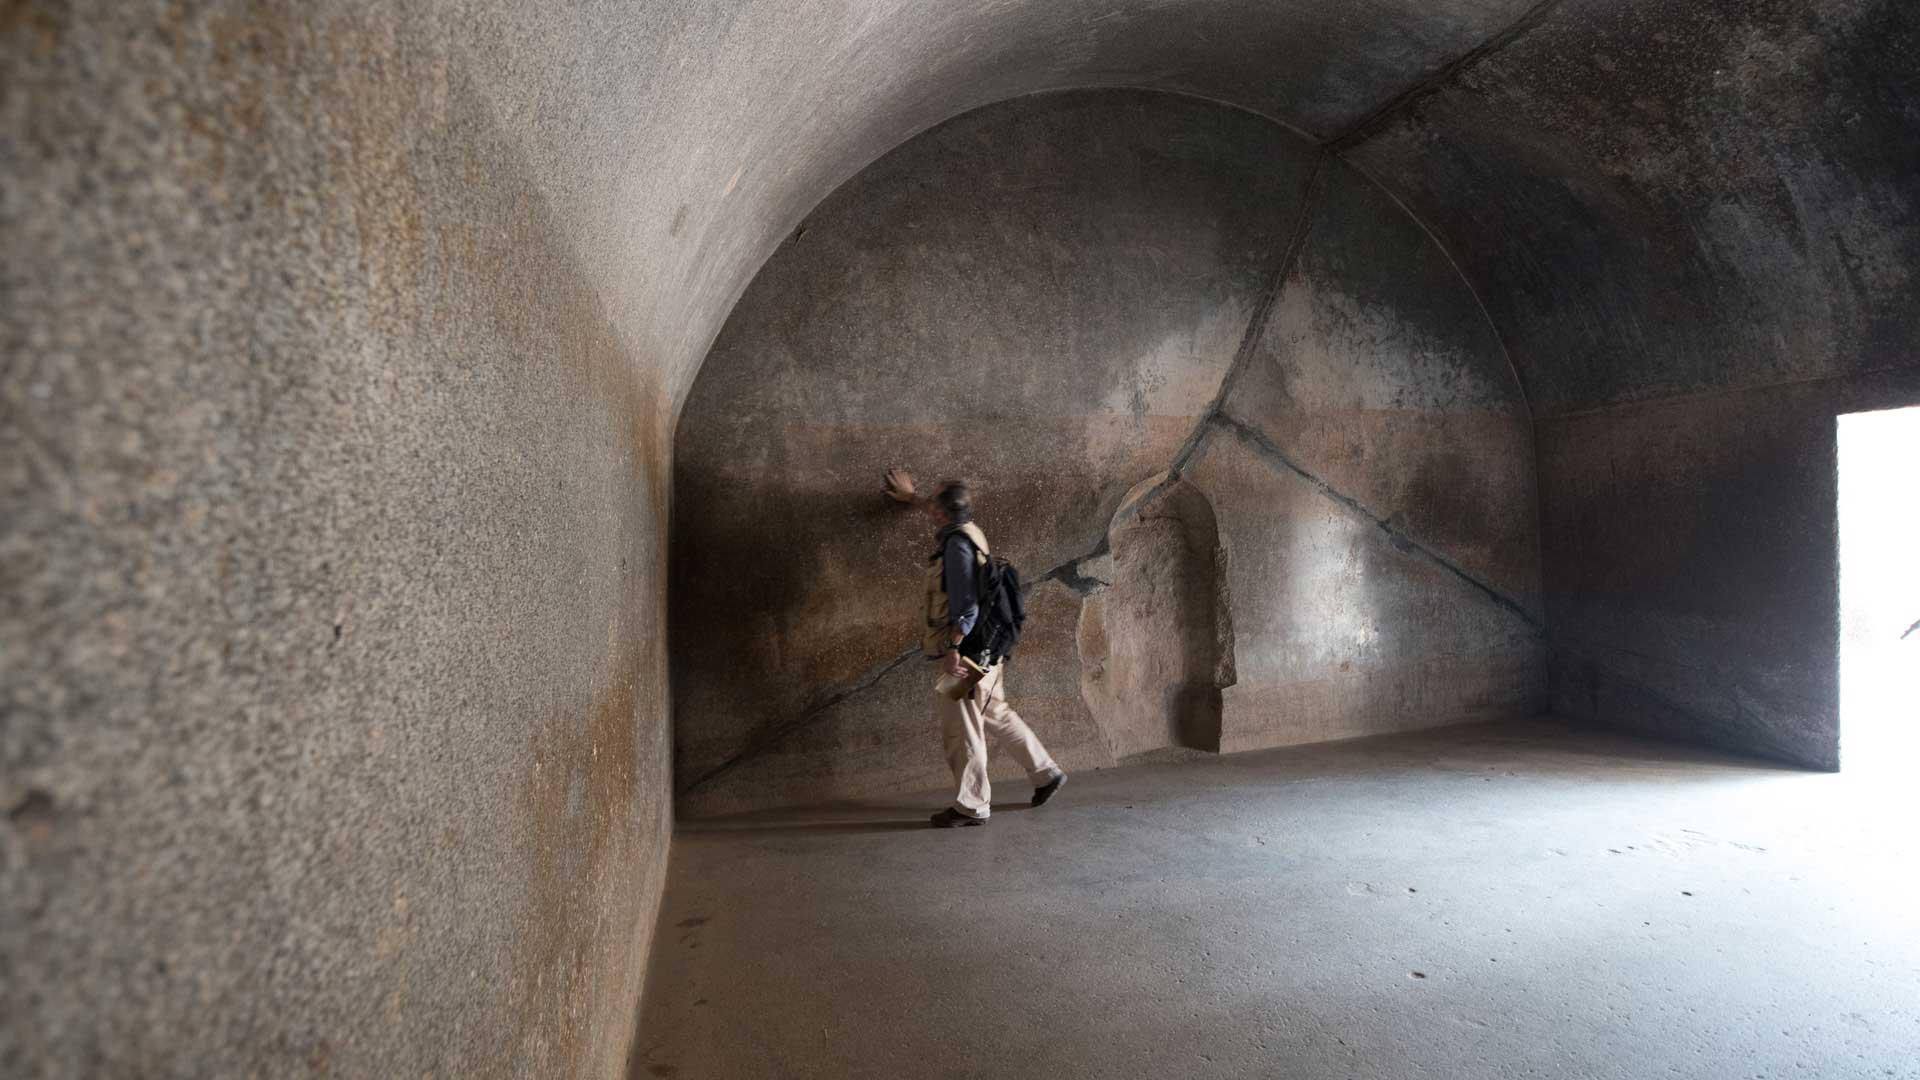 Barabar-BAM-film-granit-miroir-pyramide-inde-yoga-archeologie-21